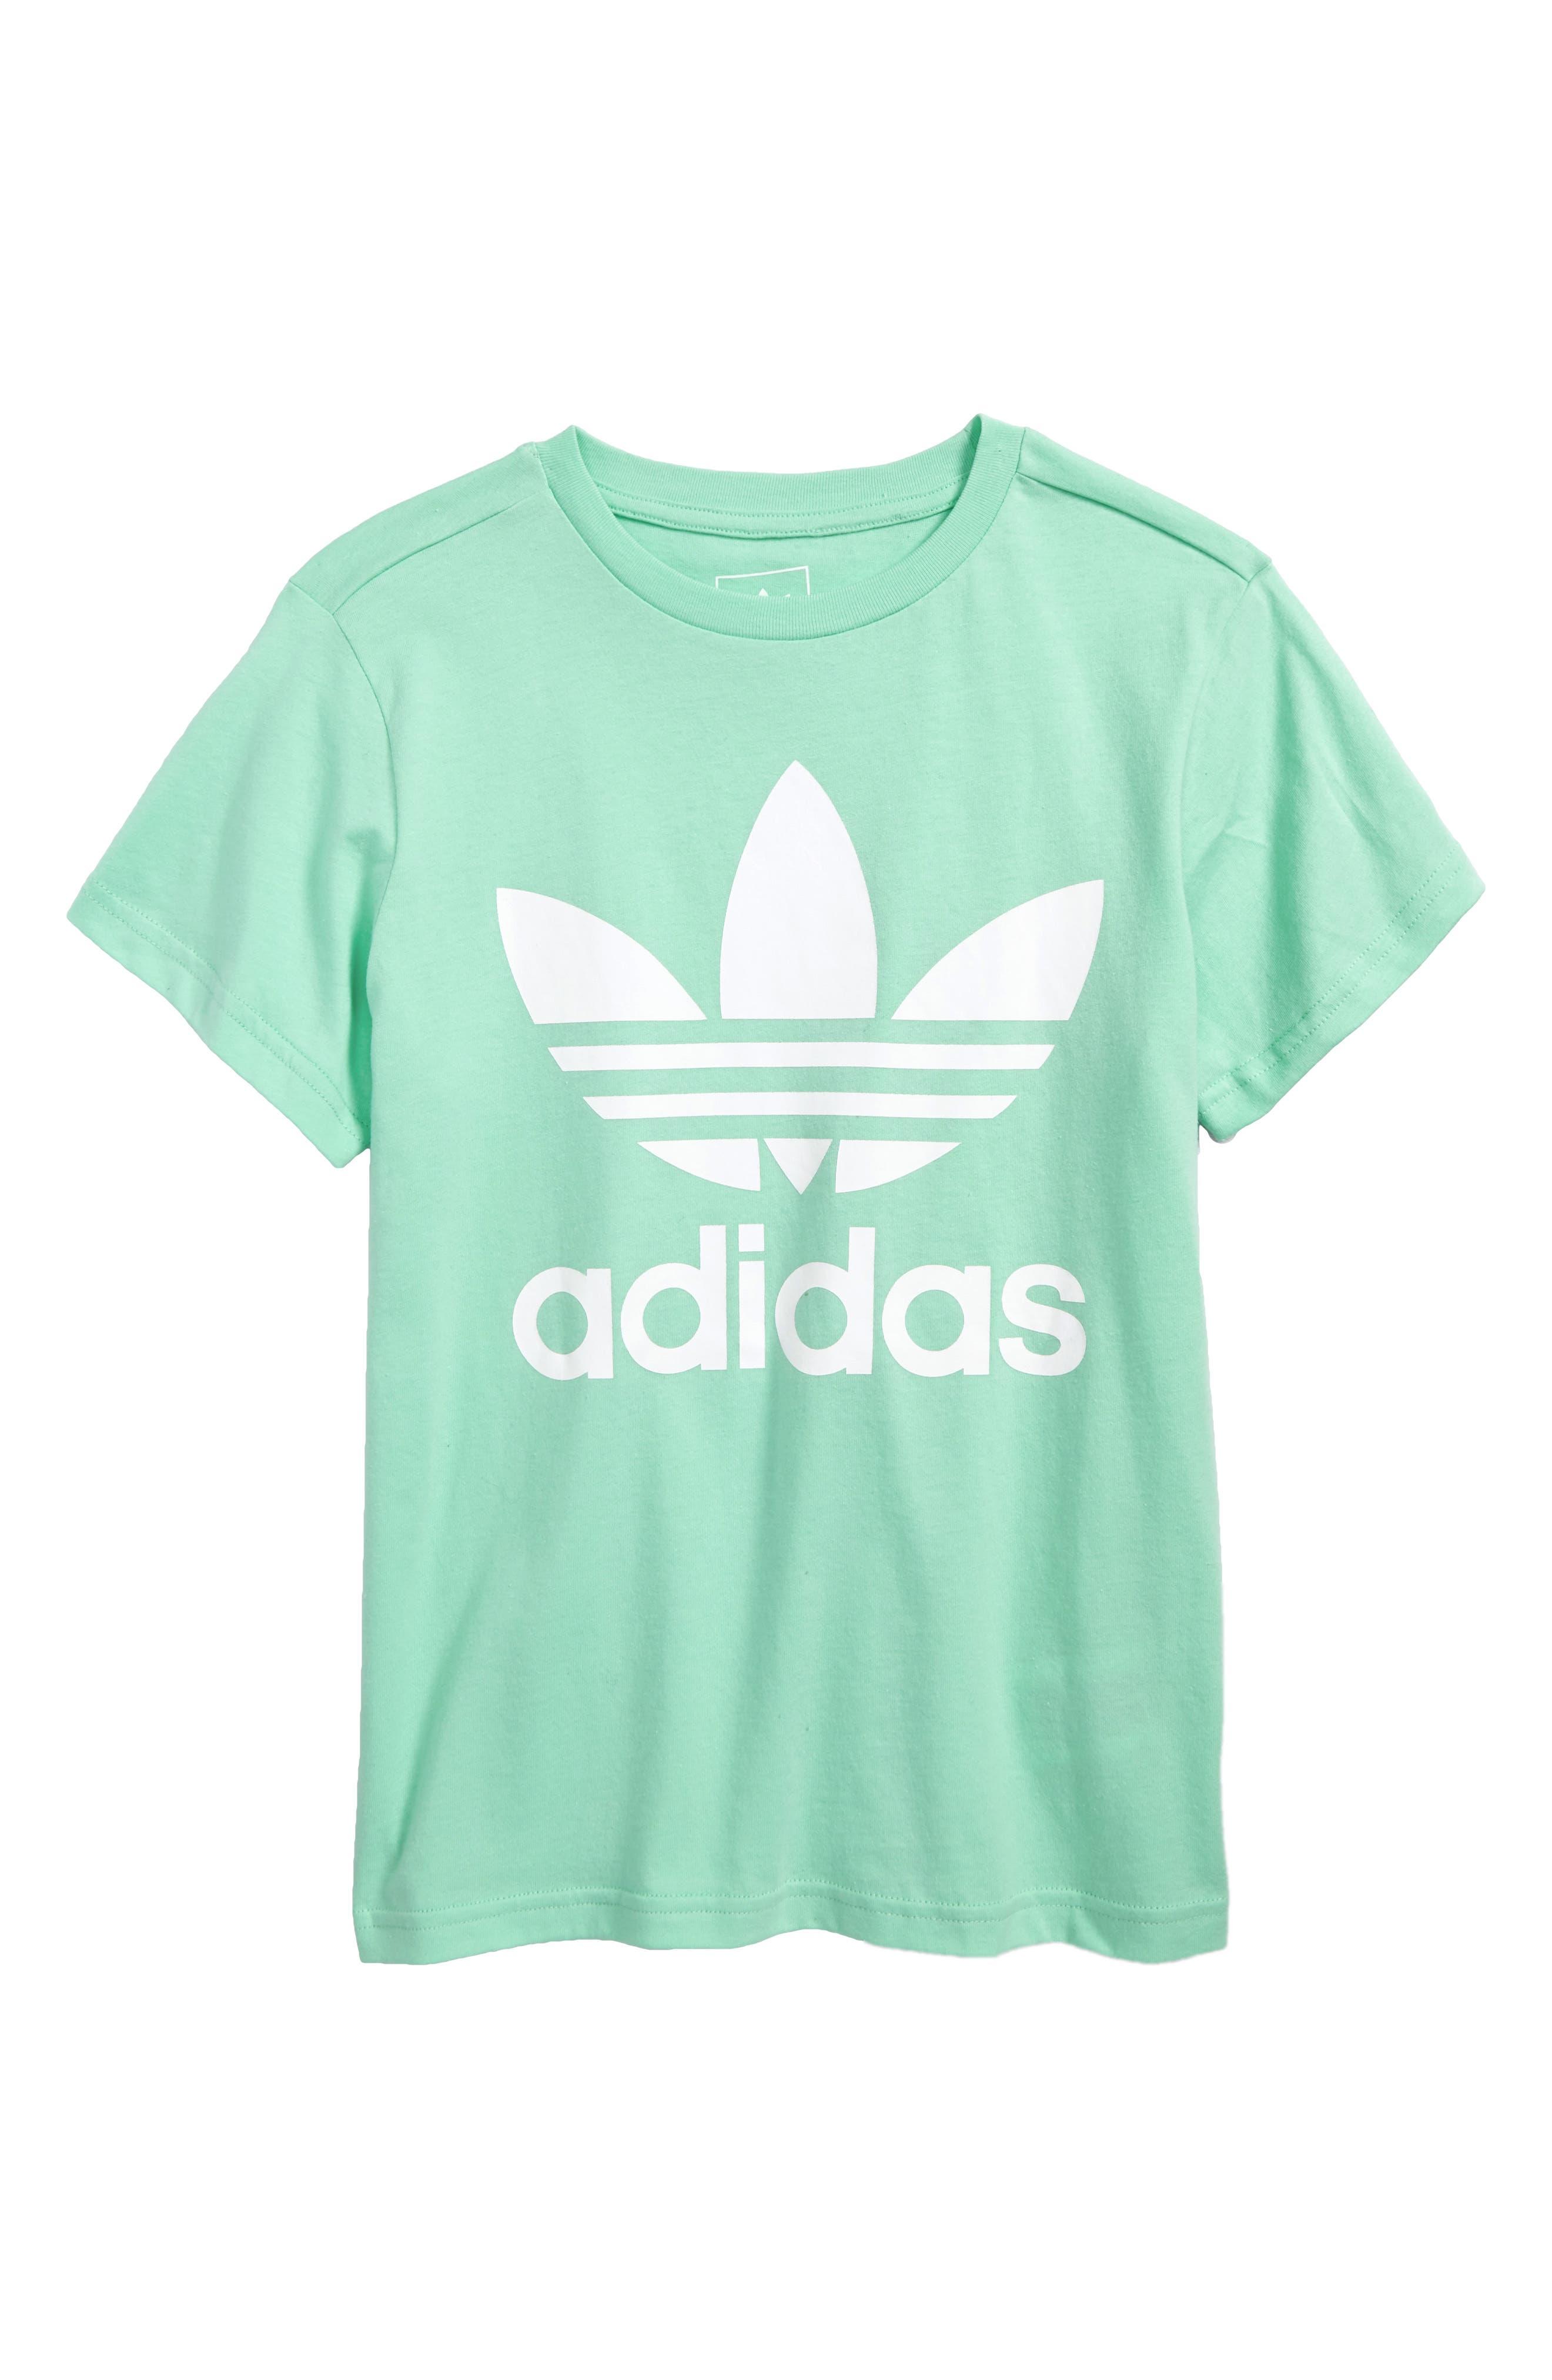 adidas Trefoil Logo Tee (Big Girls)